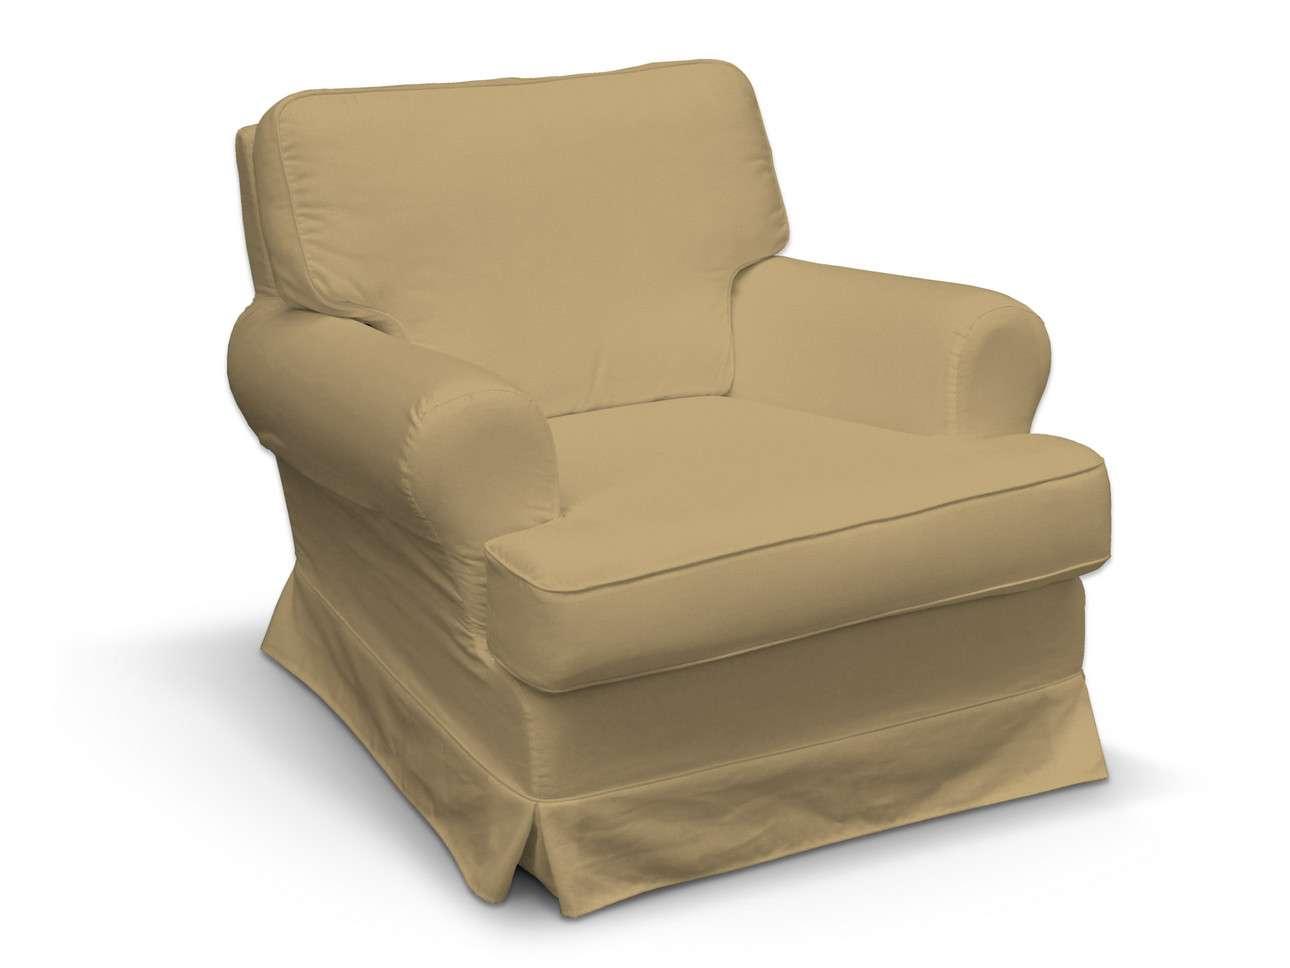 Barkaby Sesselbezug von der Kollektion Living, Stoff: 160-93